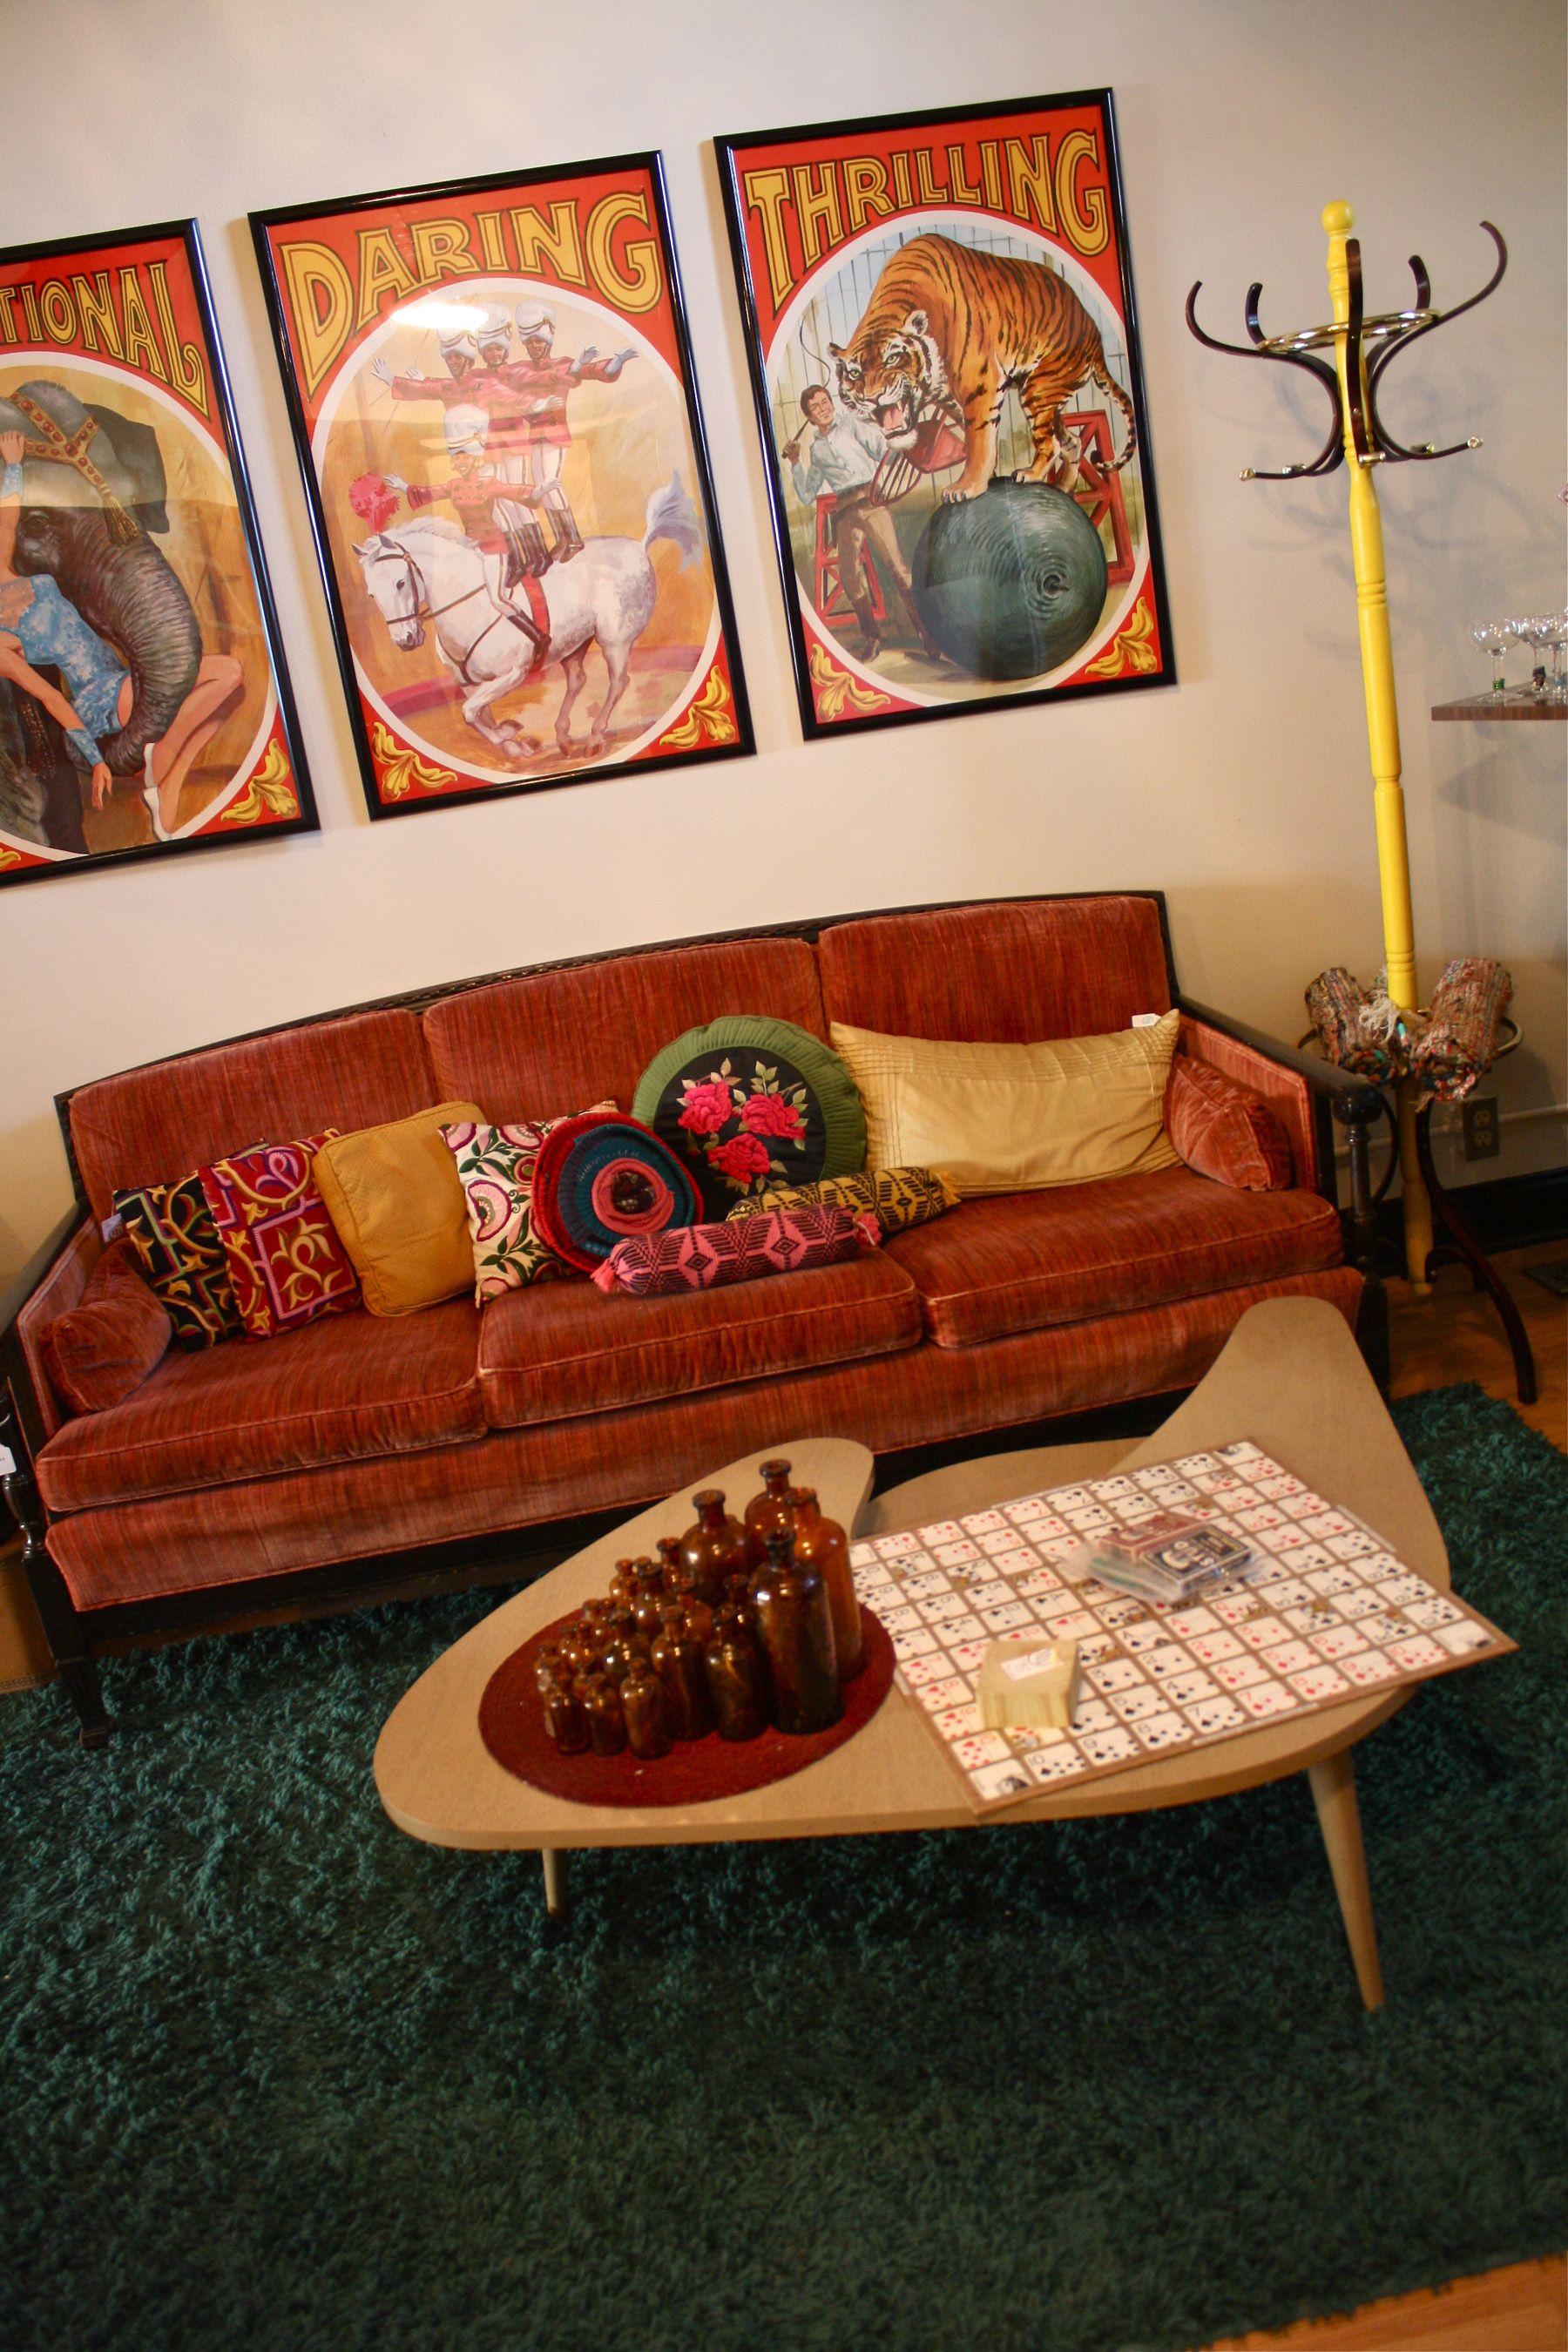 Paperdoll Vintage Boutique   Omaha, NE   Home decor, House design ...